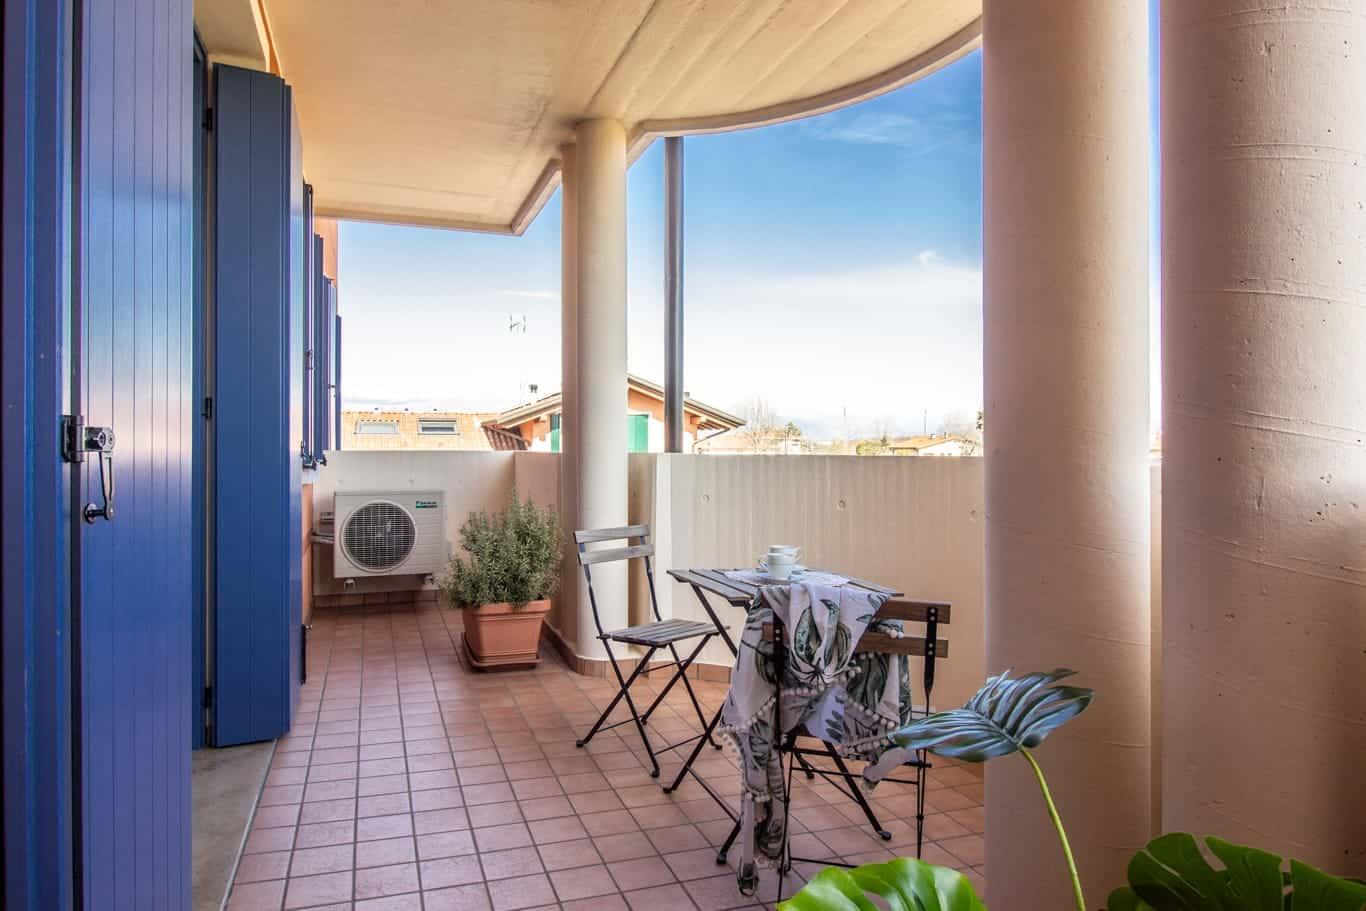 Appartamento_cimpello (7 of 8)